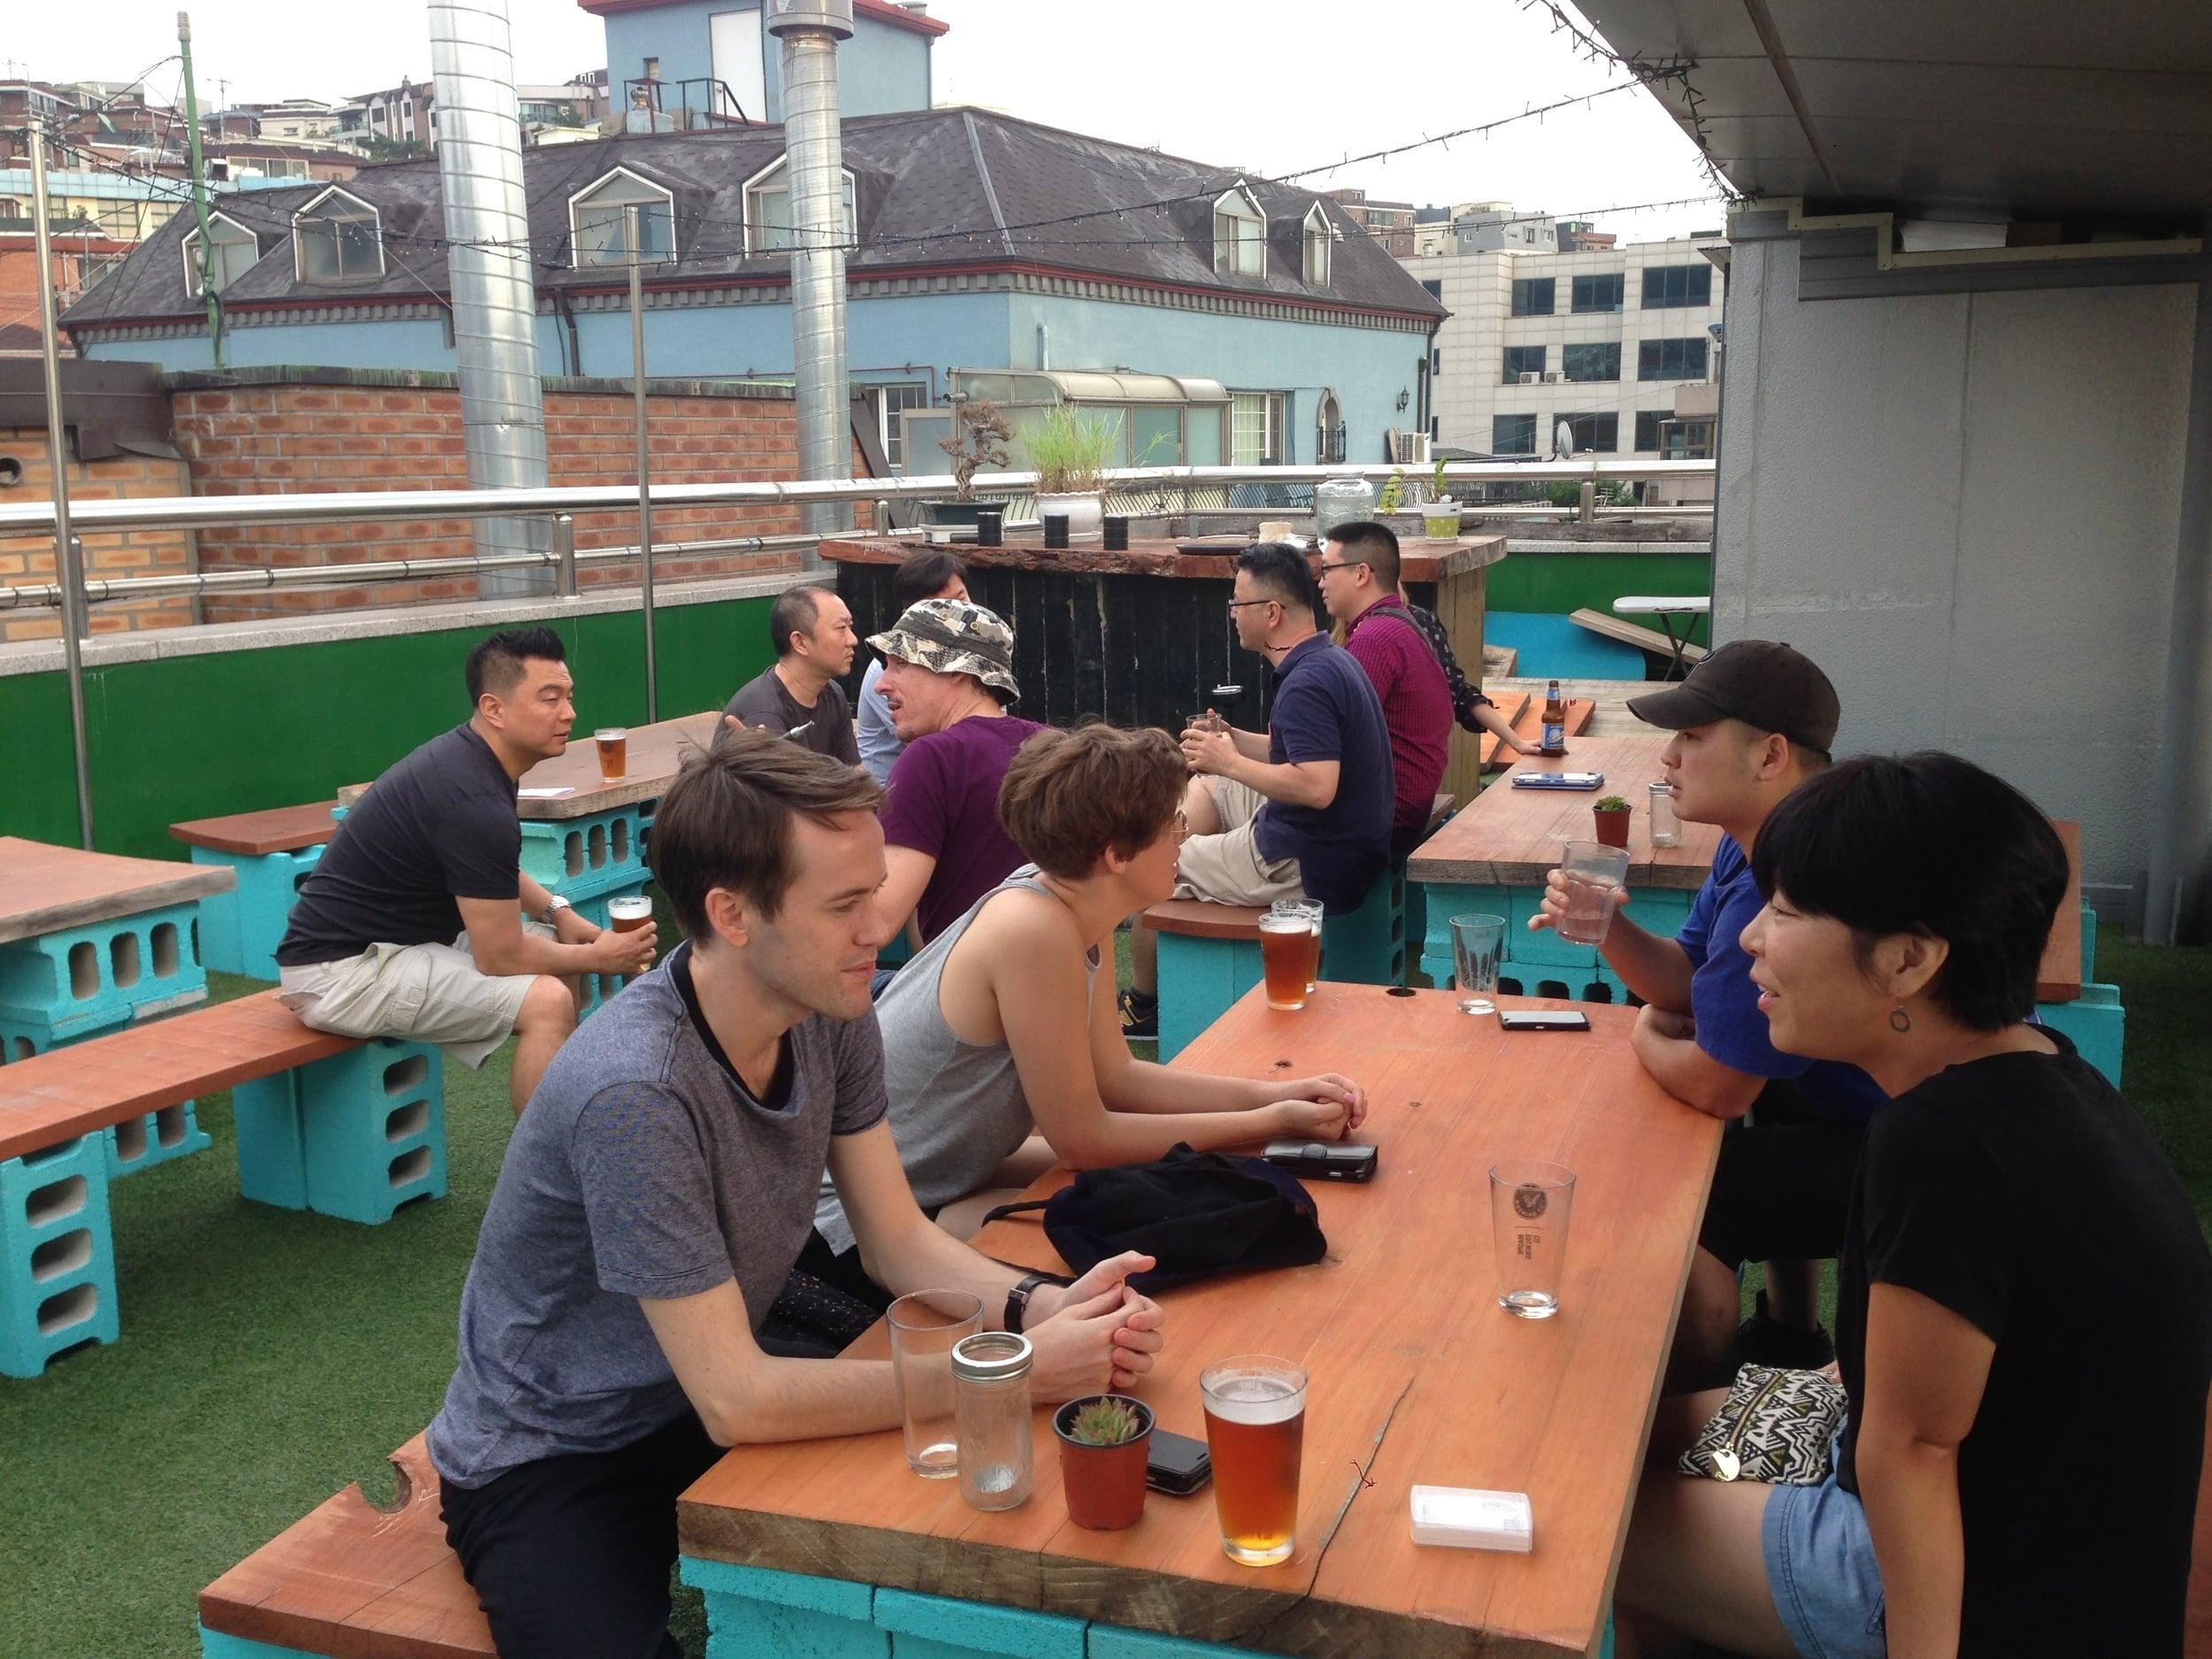 Real estate investors talking real estate on Southside Parlour's rooftop